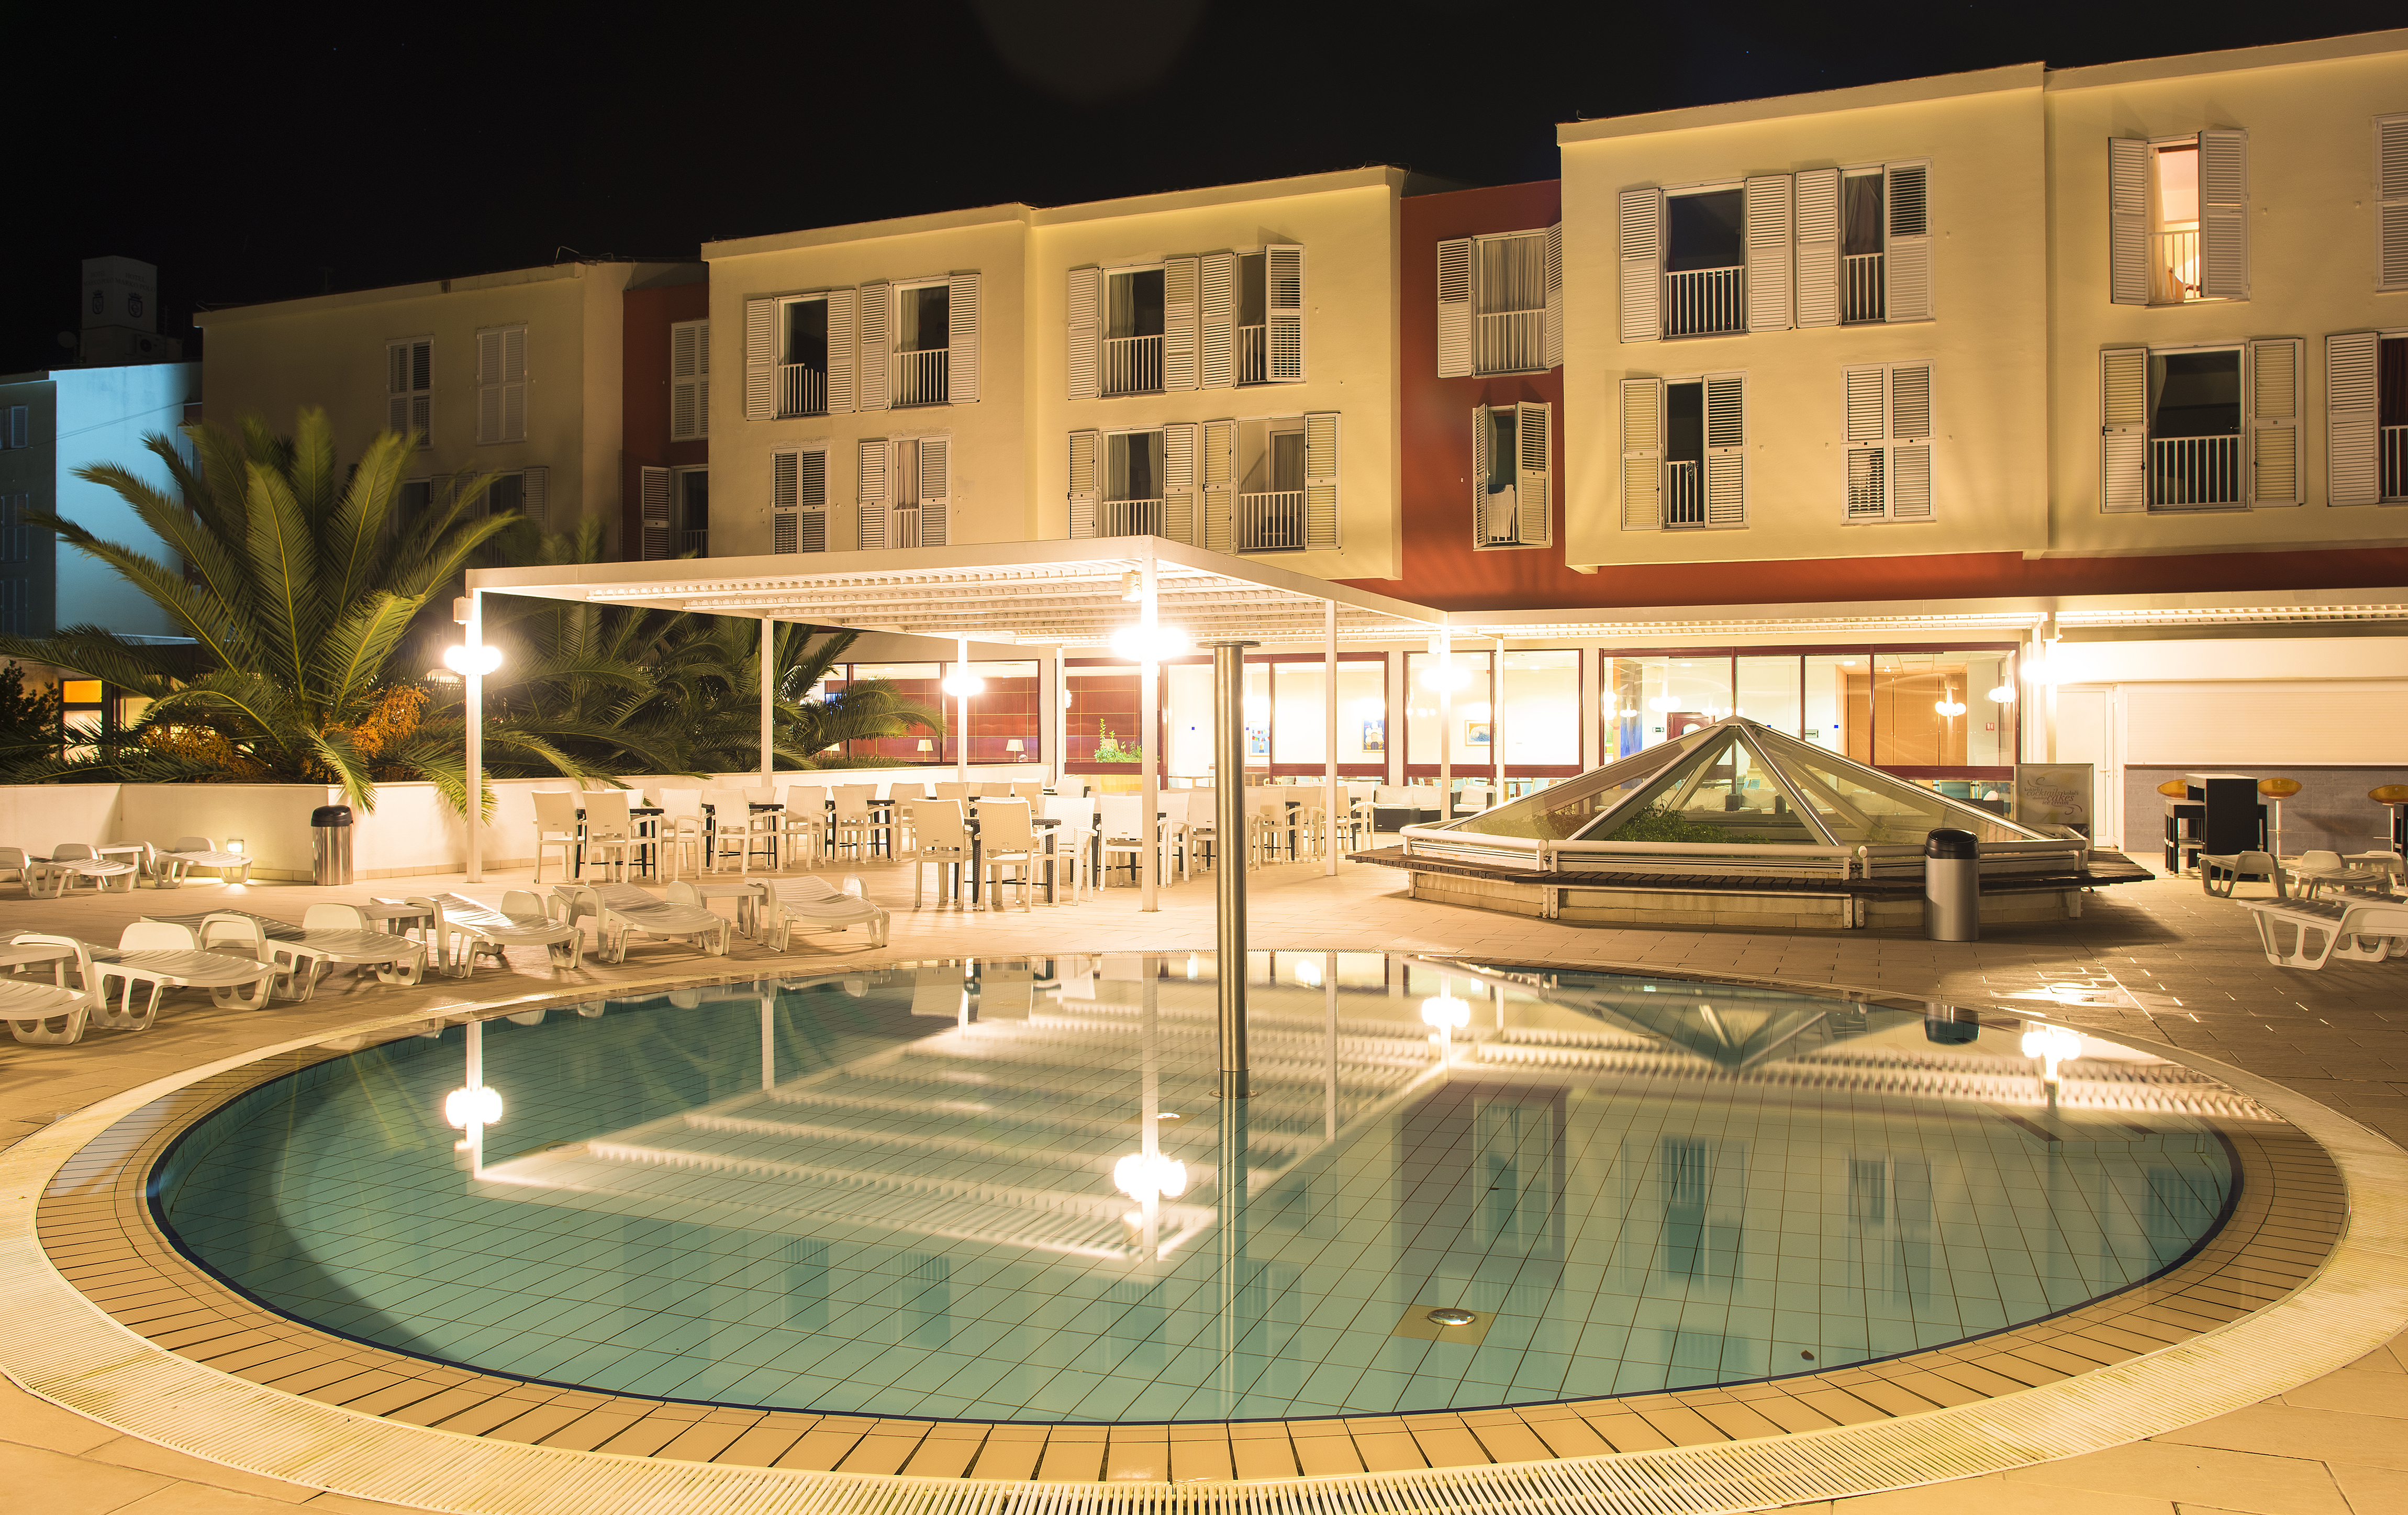 Hotel_Marko_Polo_Korčula_16